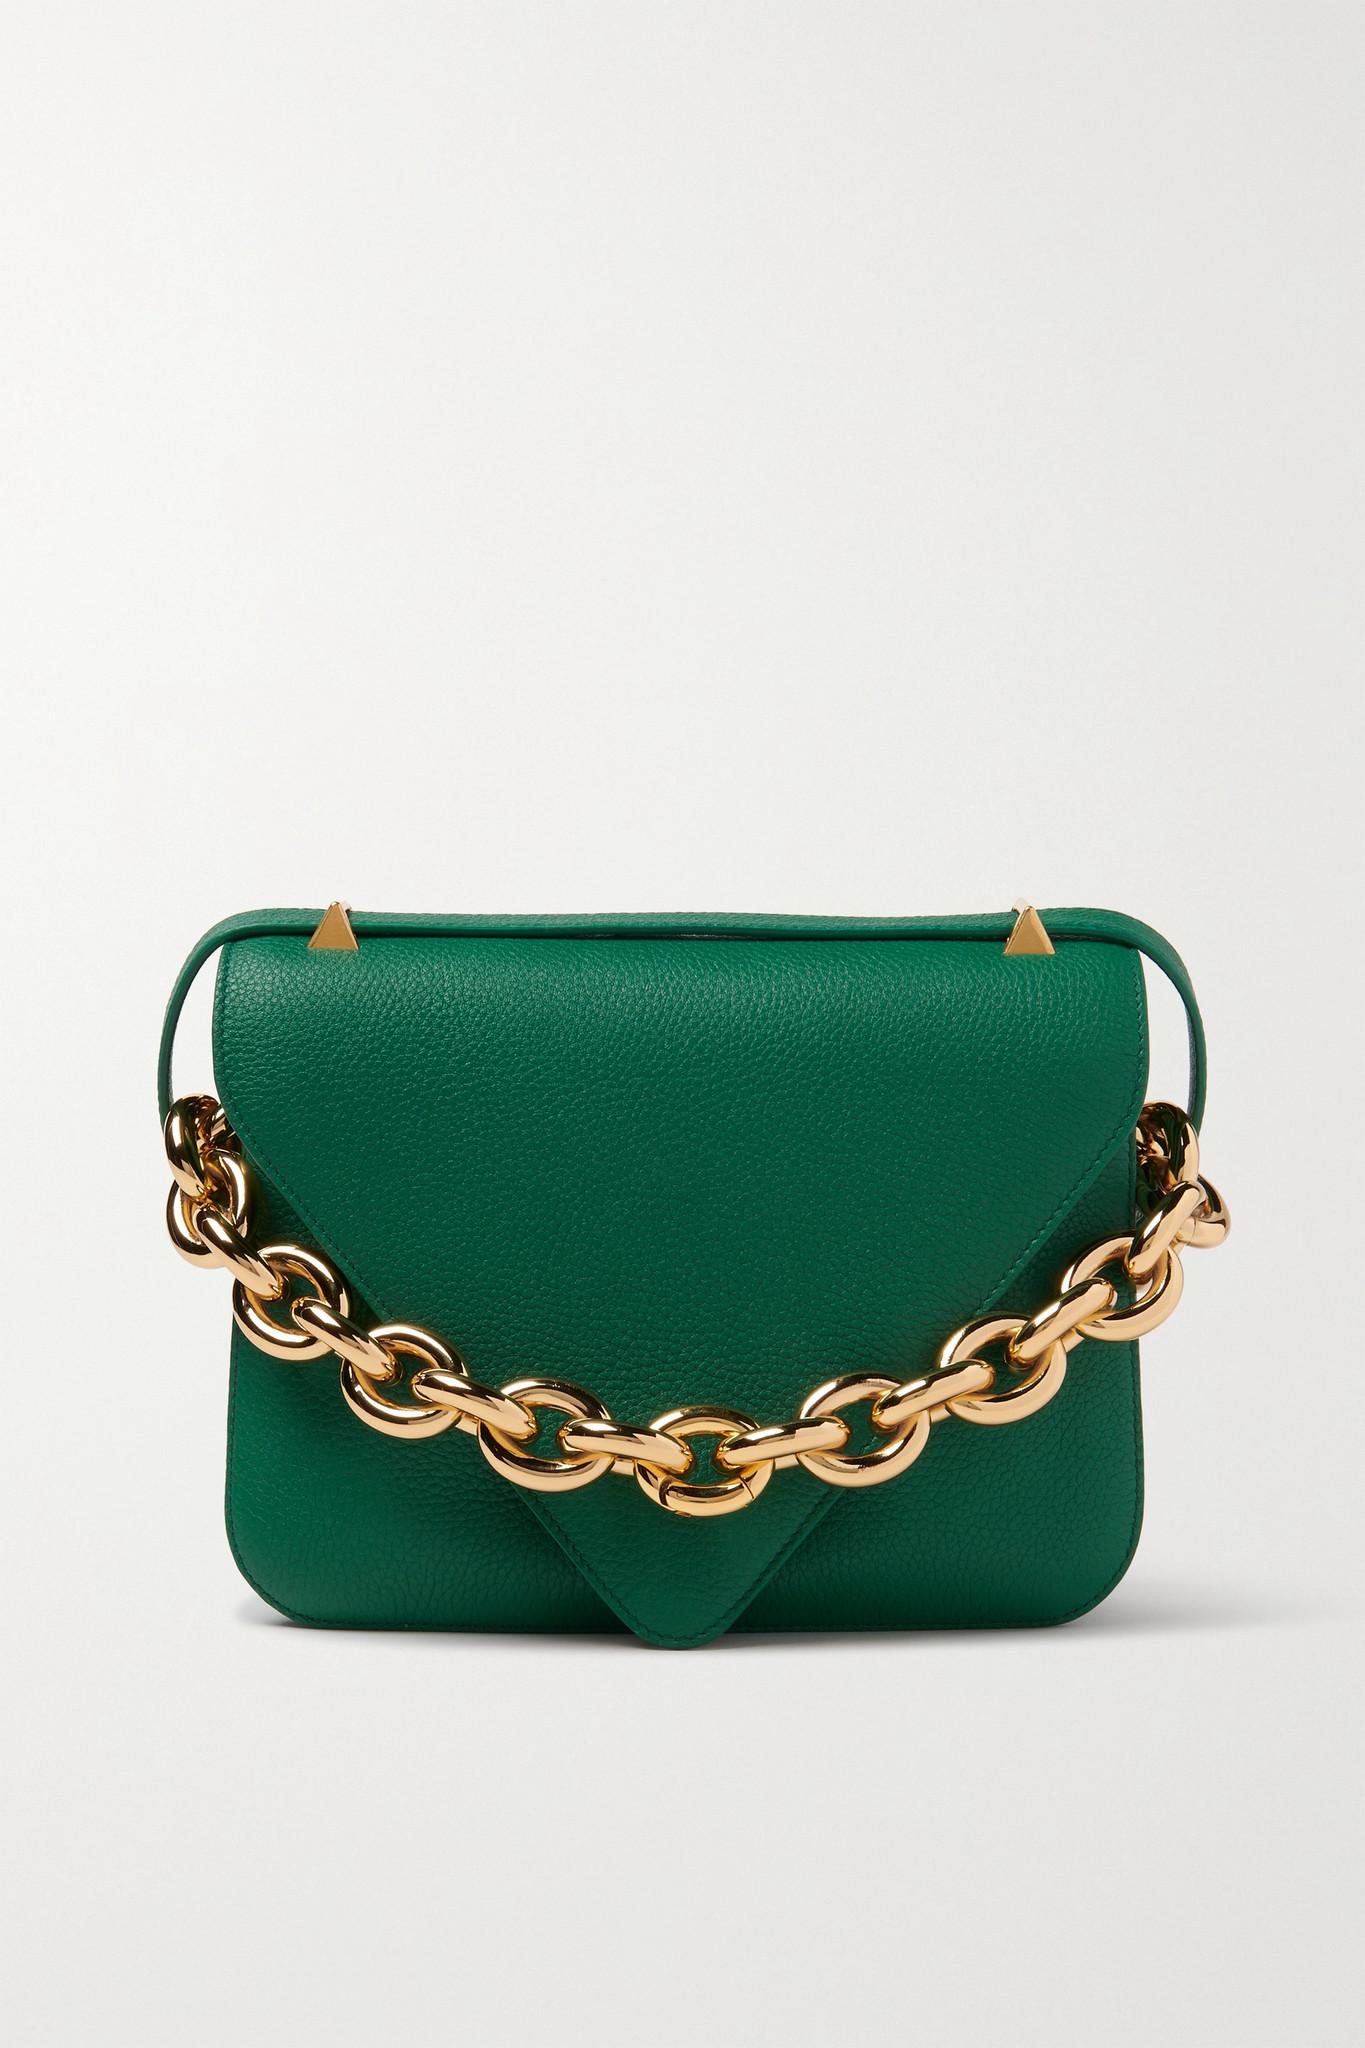 BOTTEGA VENETA - Mount Small Textured-leather Shoulder Bag - Green - one size